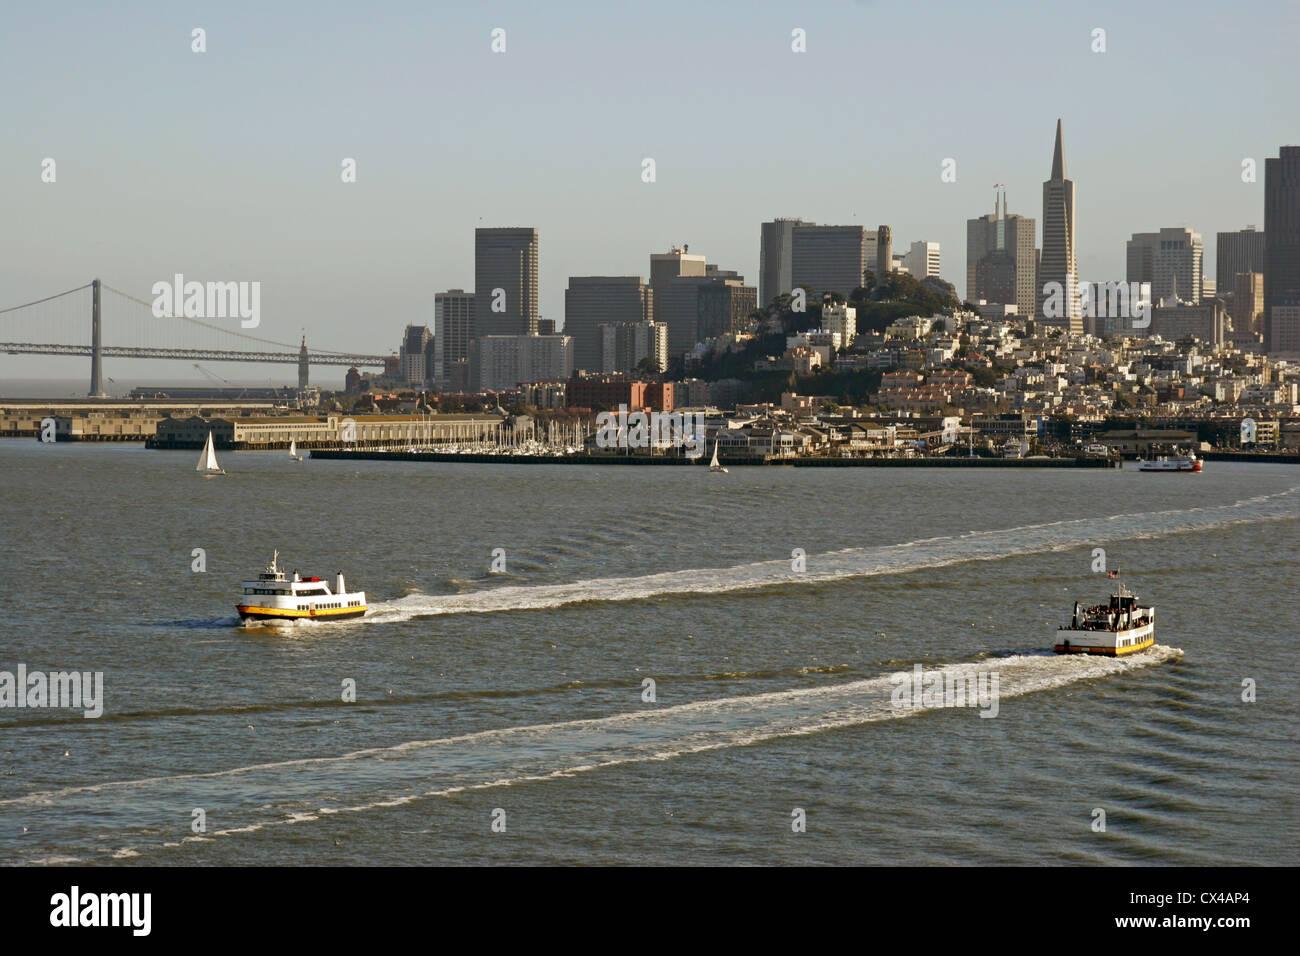 Ferries cross between Alcatraz Island and San Francisco's waterfront. California, USA. - Stock Image